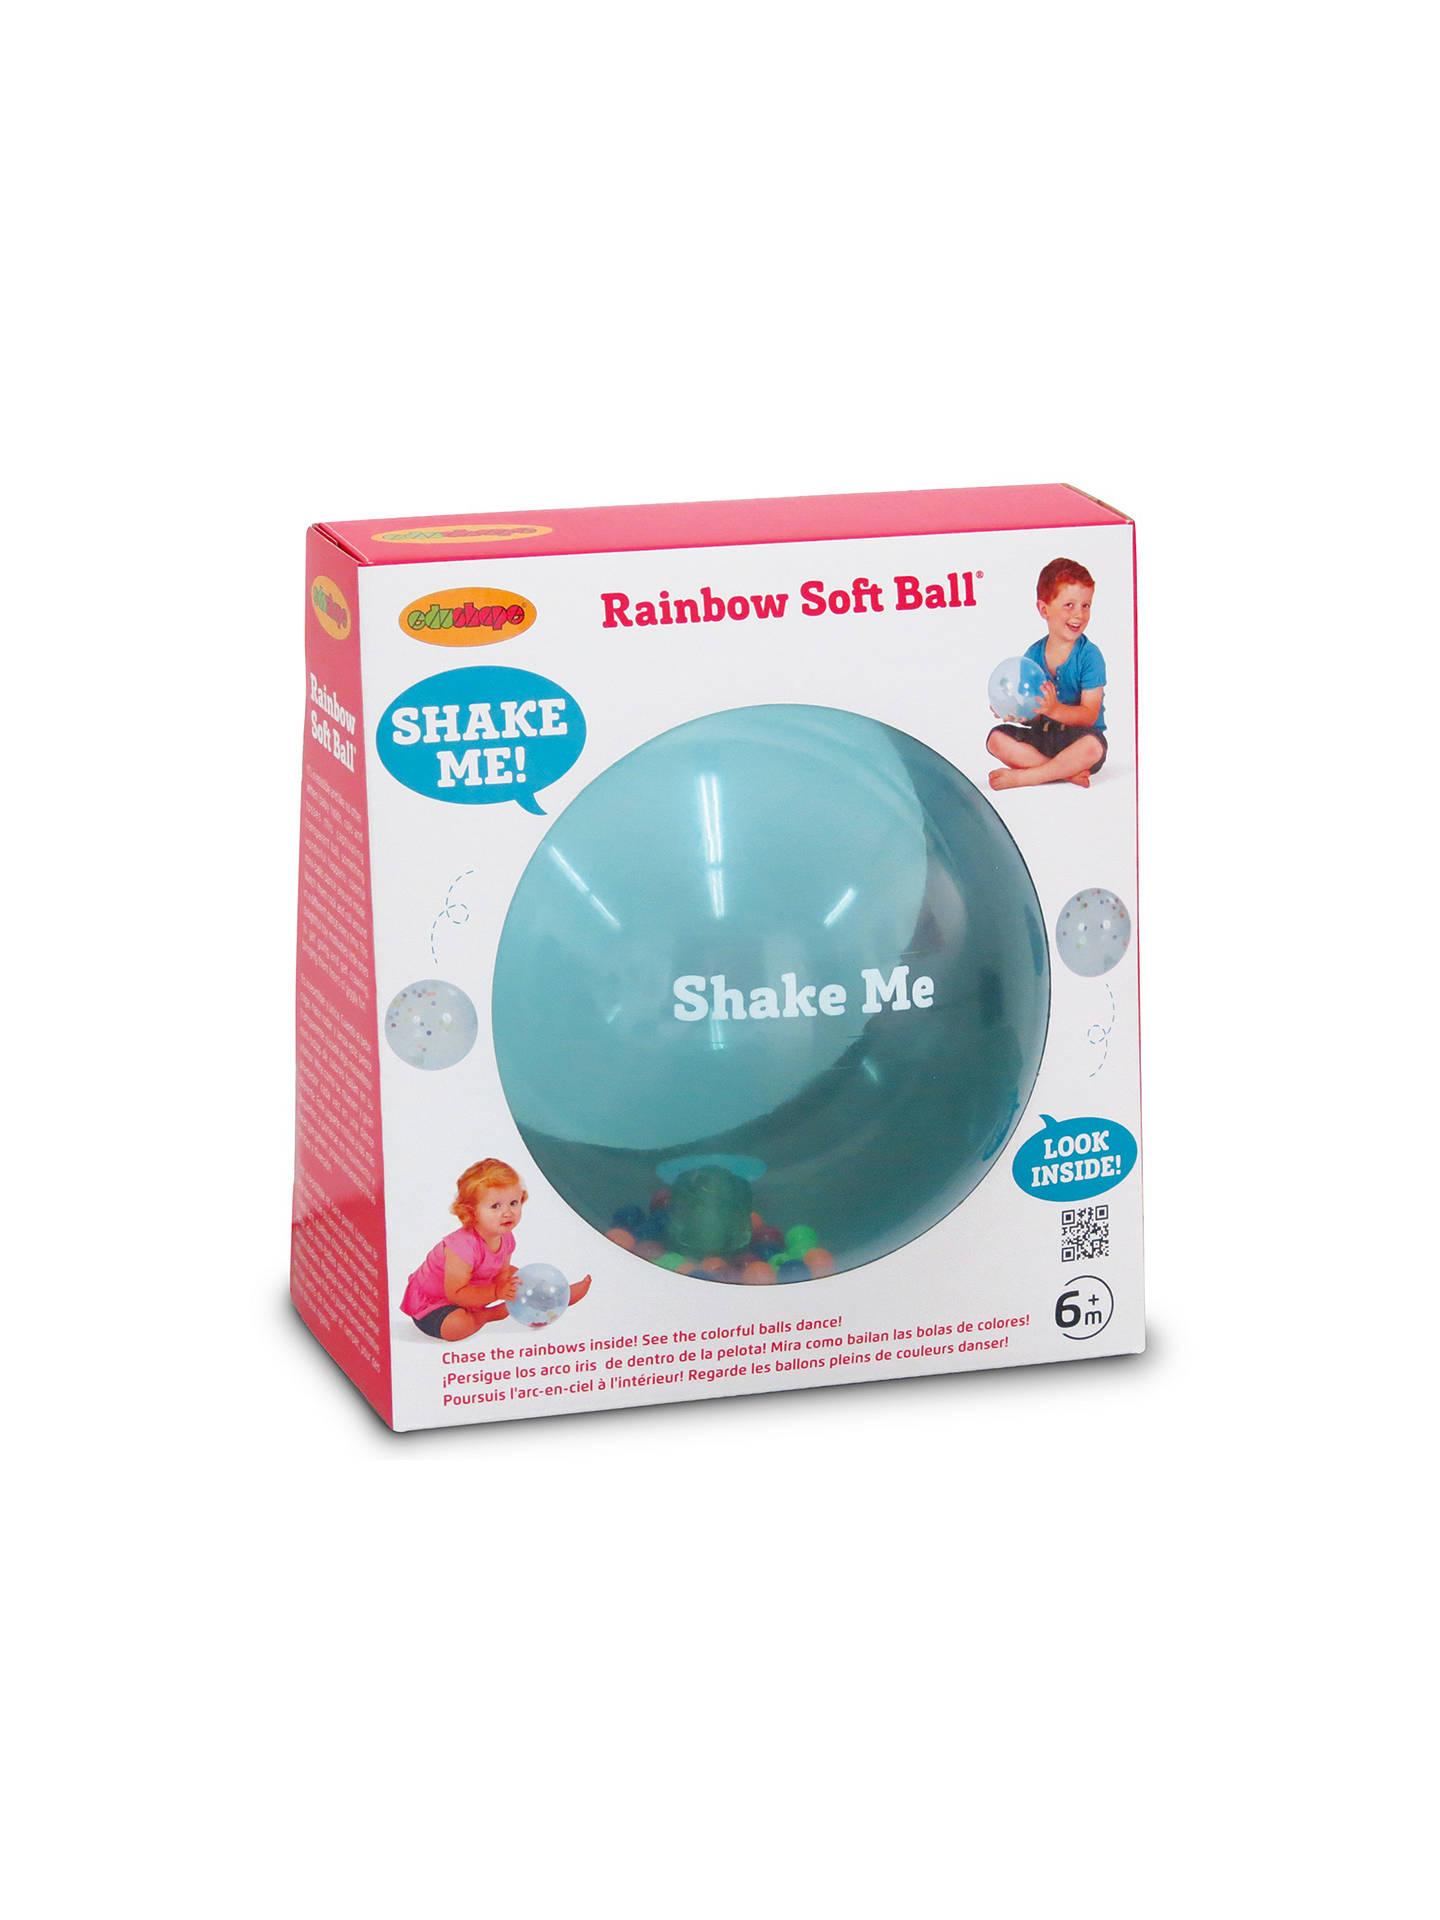 Bola Laundry 5 Pcs Set Ball Daftar Harga Terbaru Hpr009 Karet Pencuci Baju Clean Buyedushape Rainbow Soft Sensory Online At Johnlewiscom